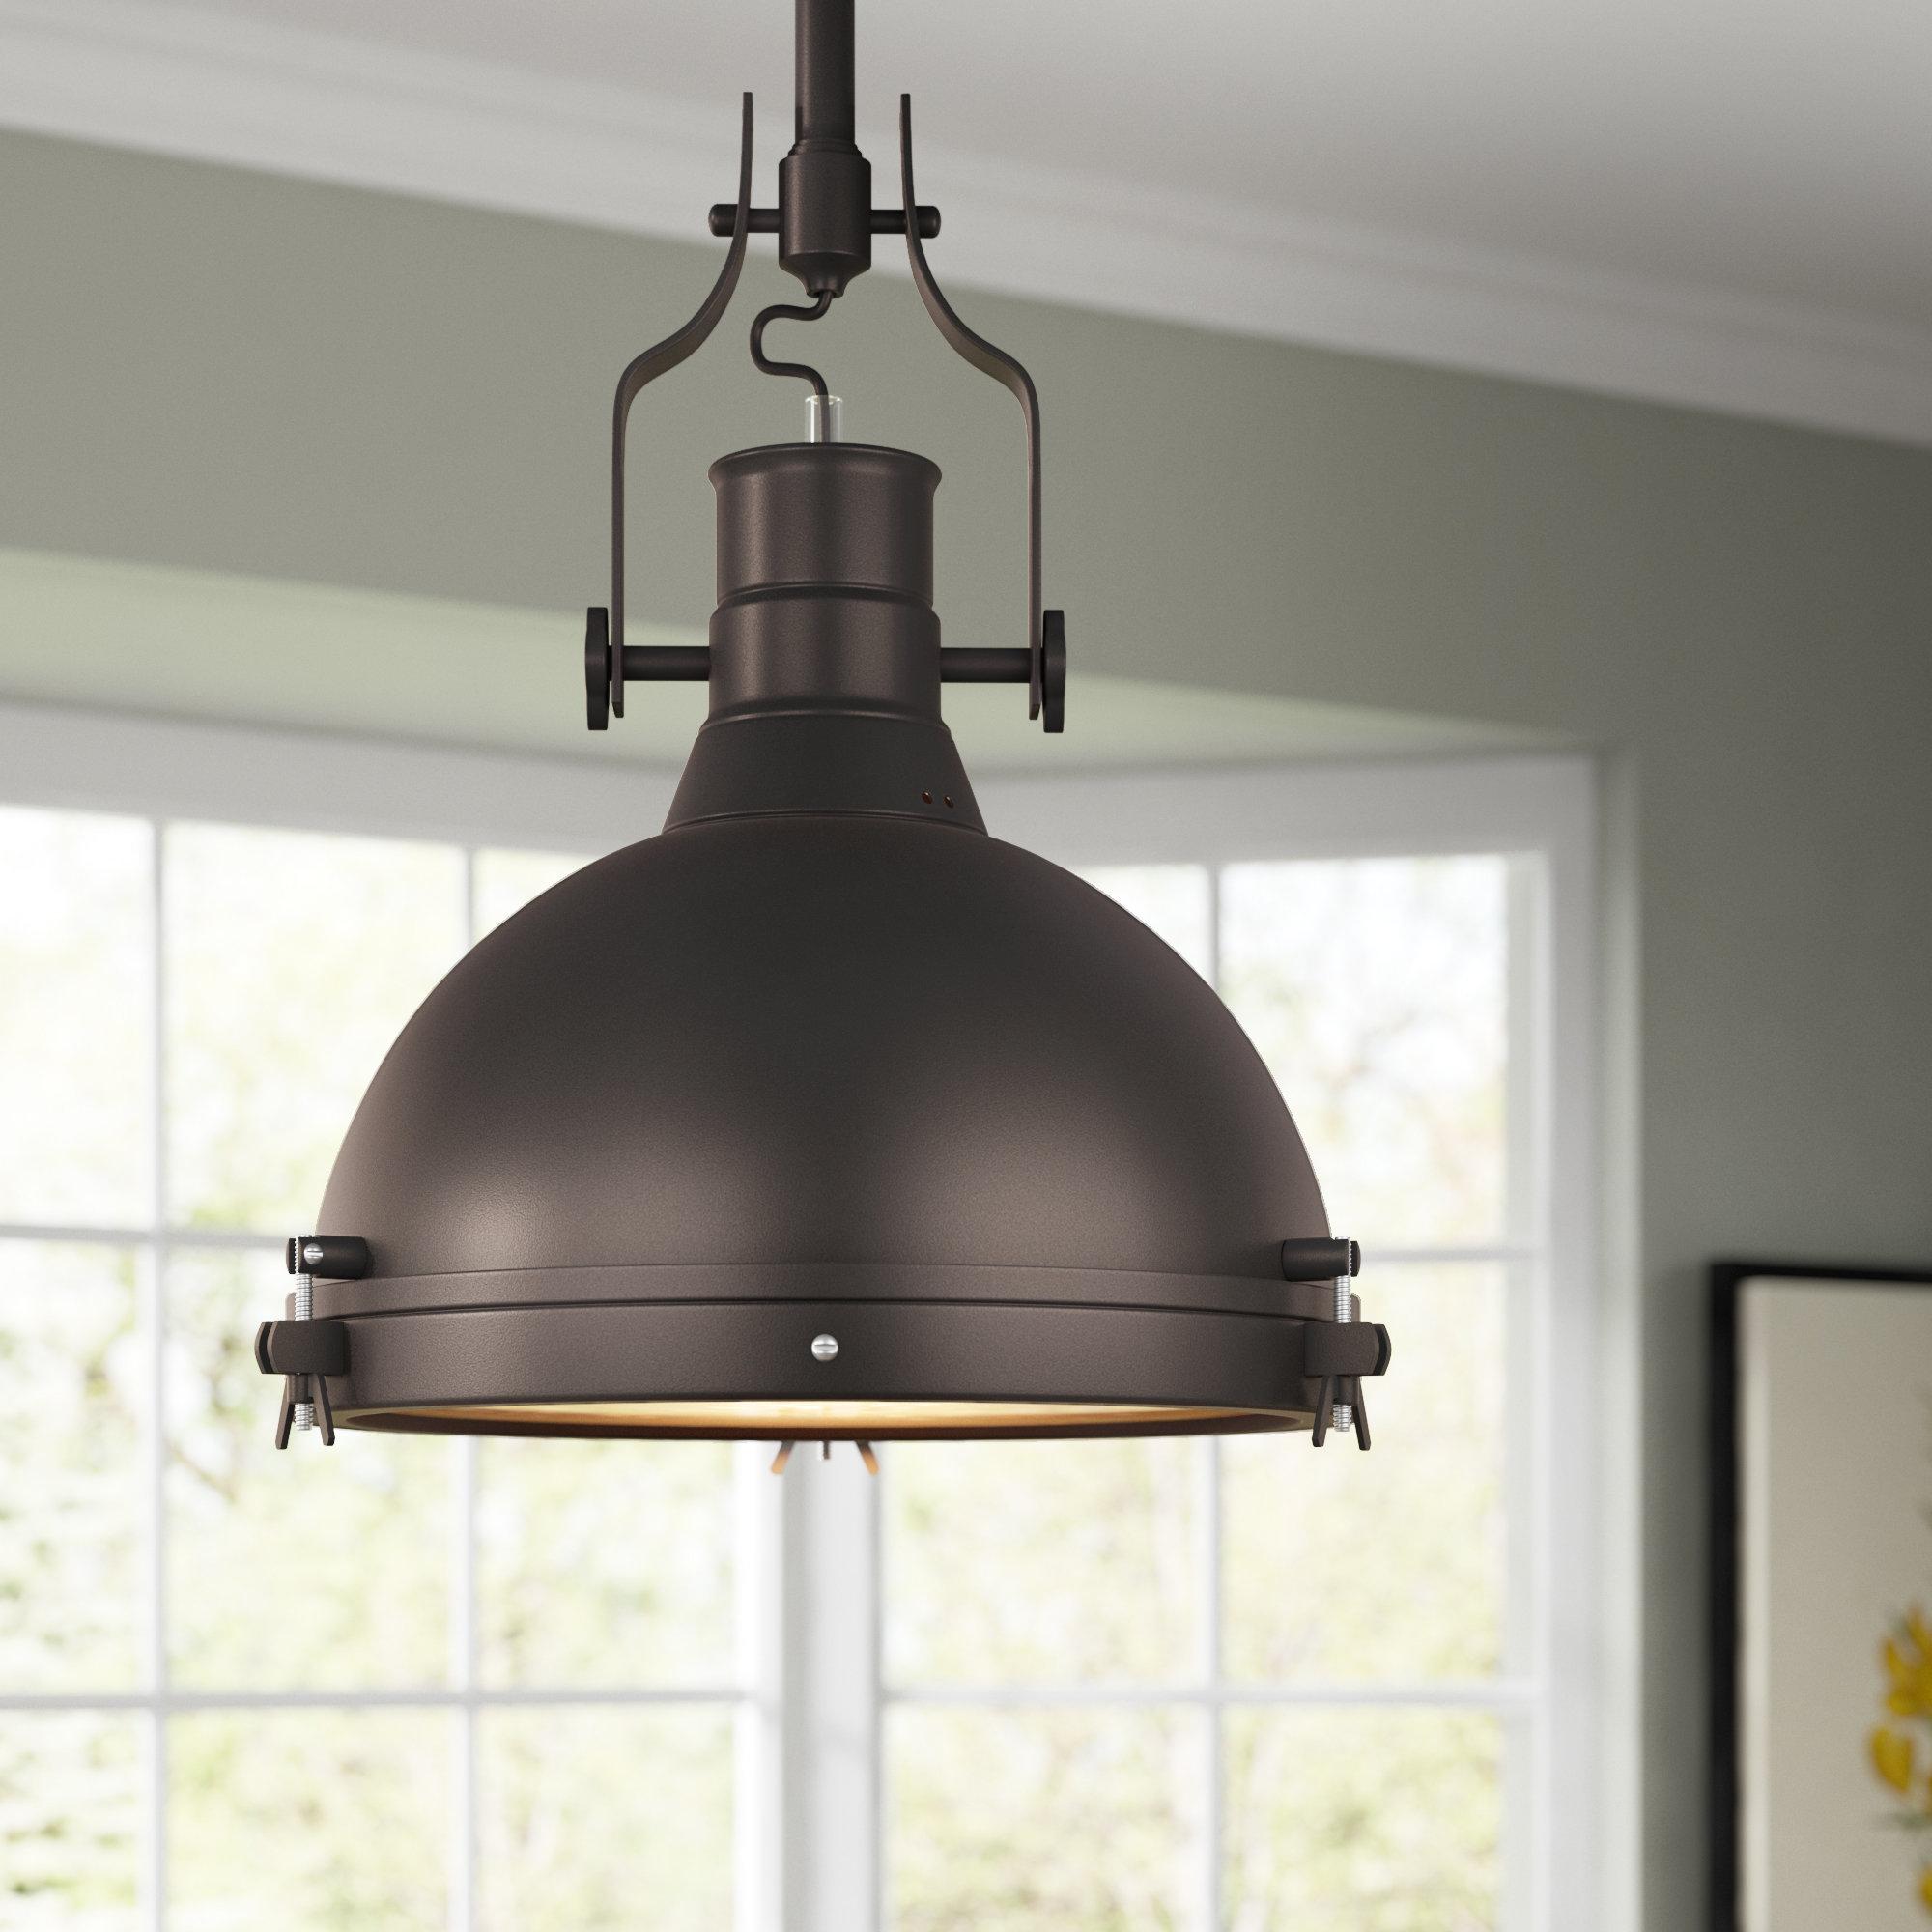 Fashionable Wamblee 1 Light Single Dome Pendant With Freeda 1 Light Single Dome Pendants (View 3 of 25)